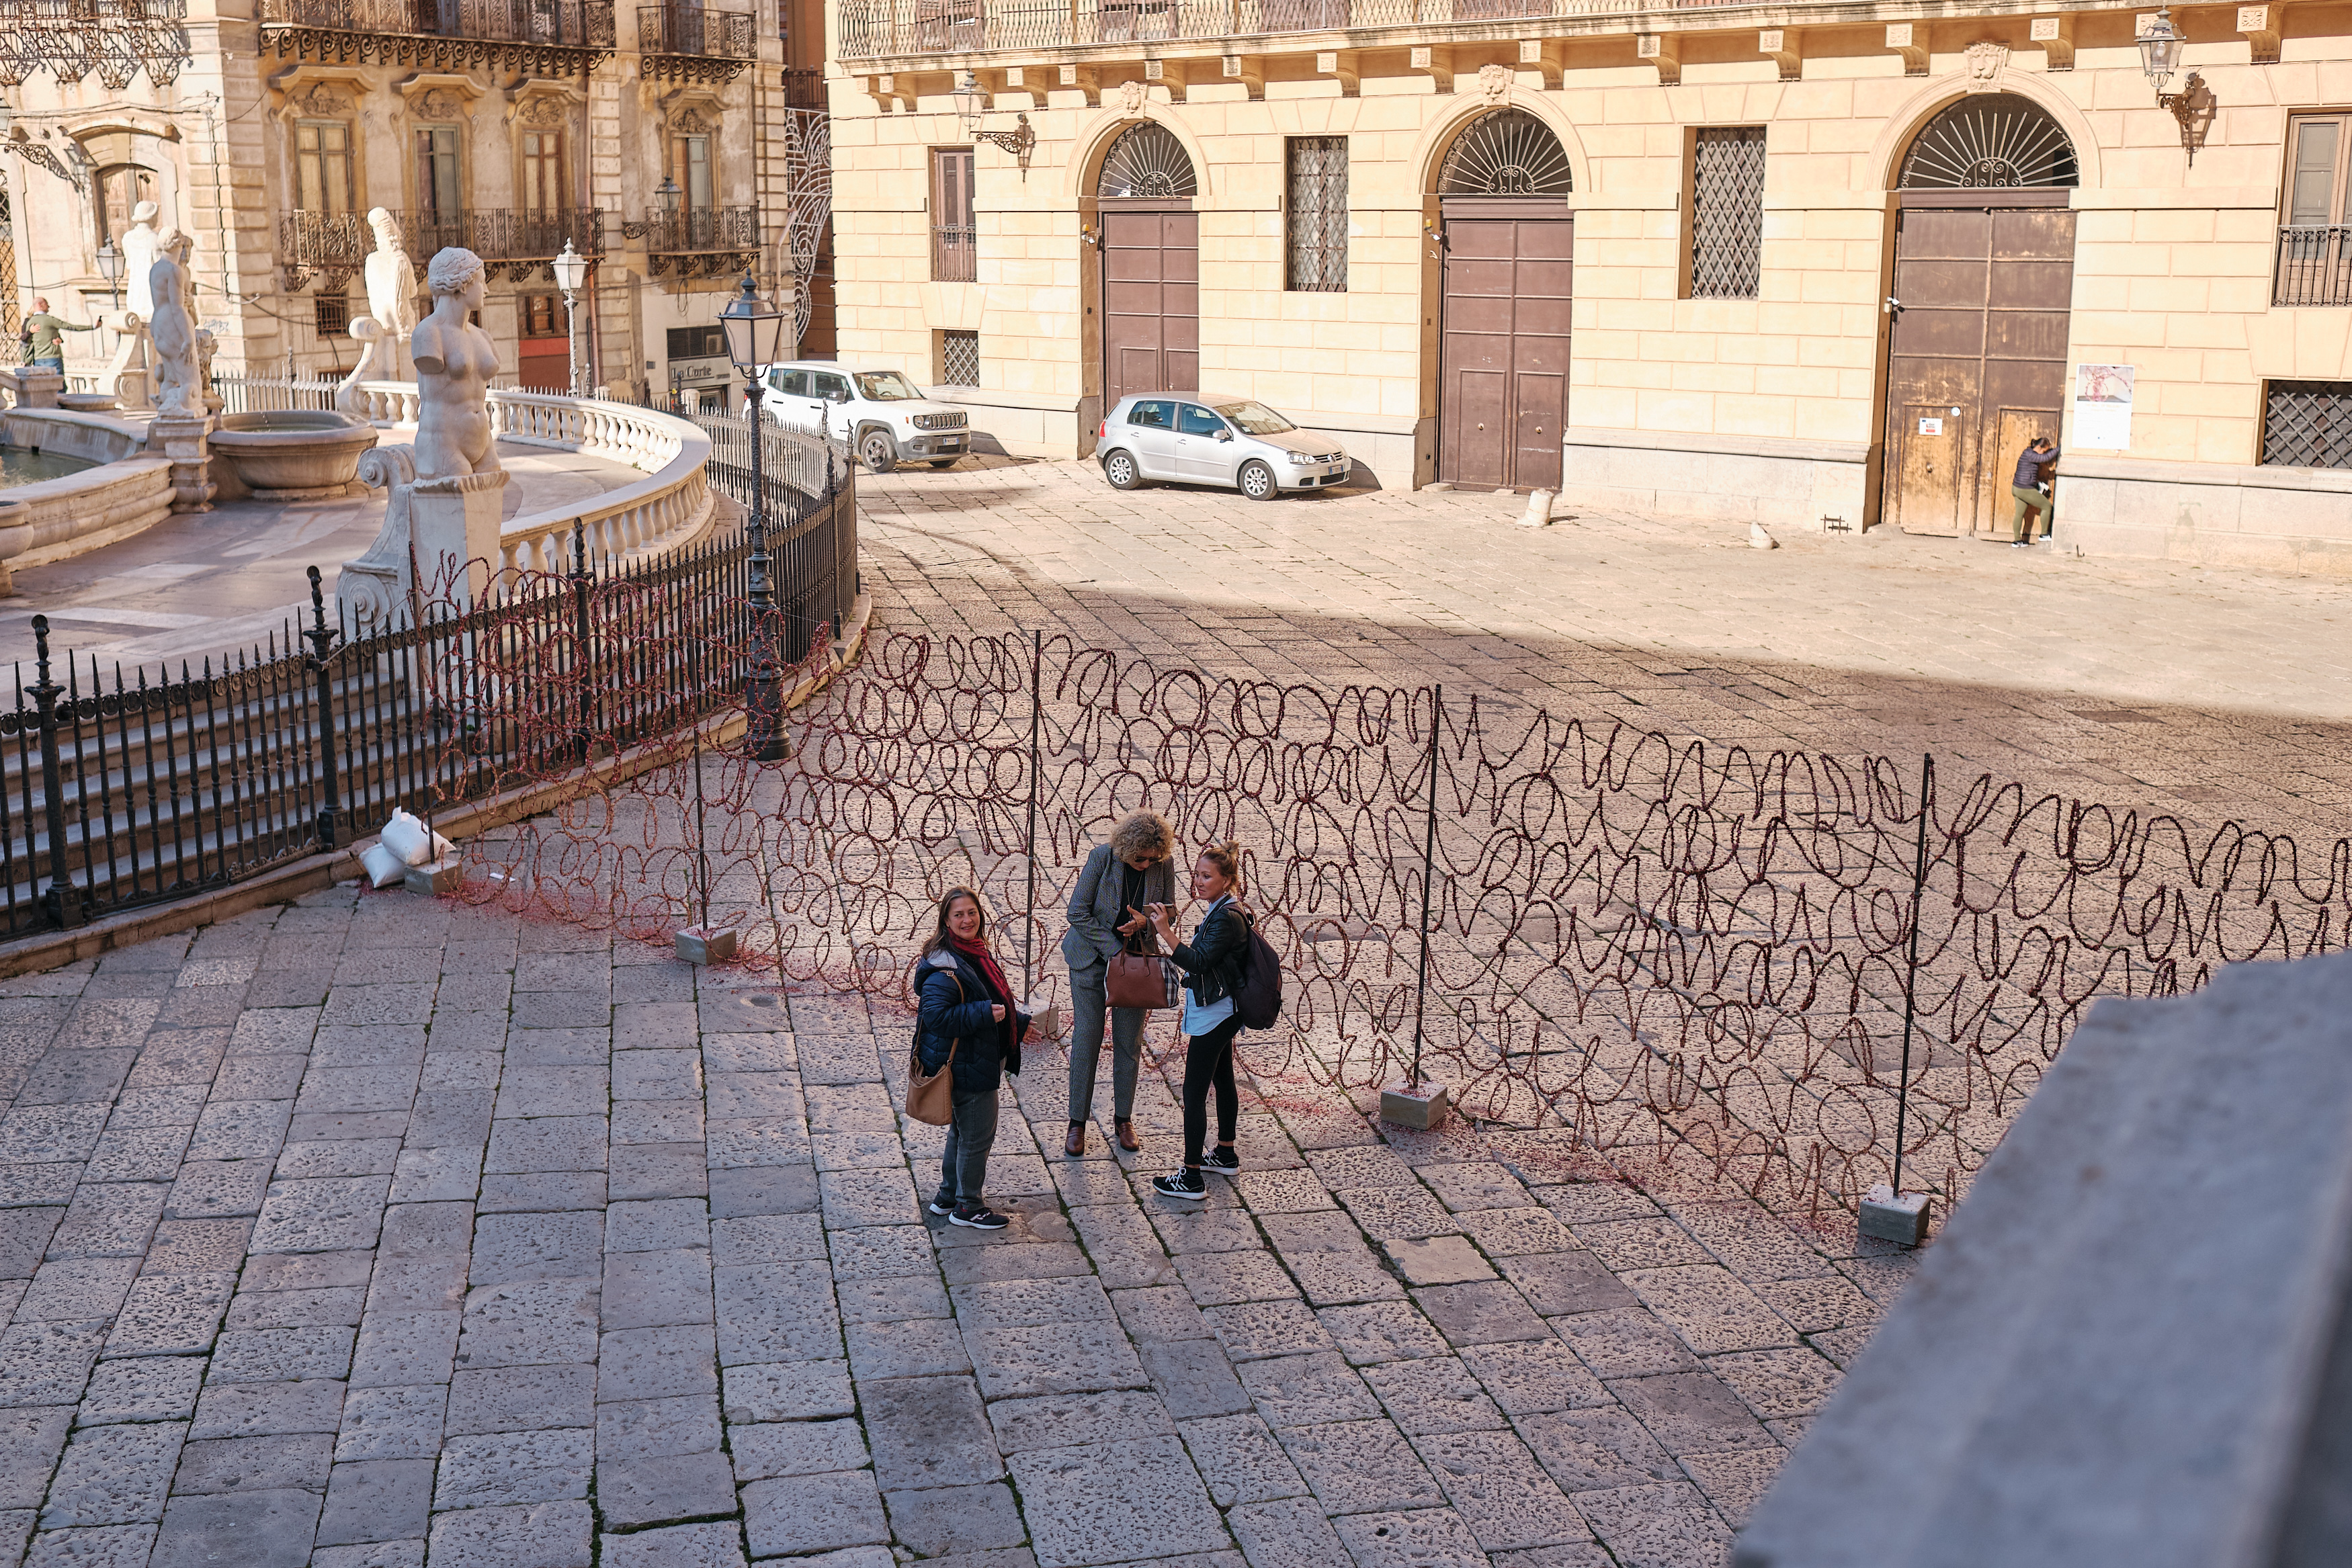 Giuseppina Giordano, THE WALL OF DELICACY, installation's view, Piazza Pretoria, Palermo, Italy / BAM Festival / ph: Dimity Codryan